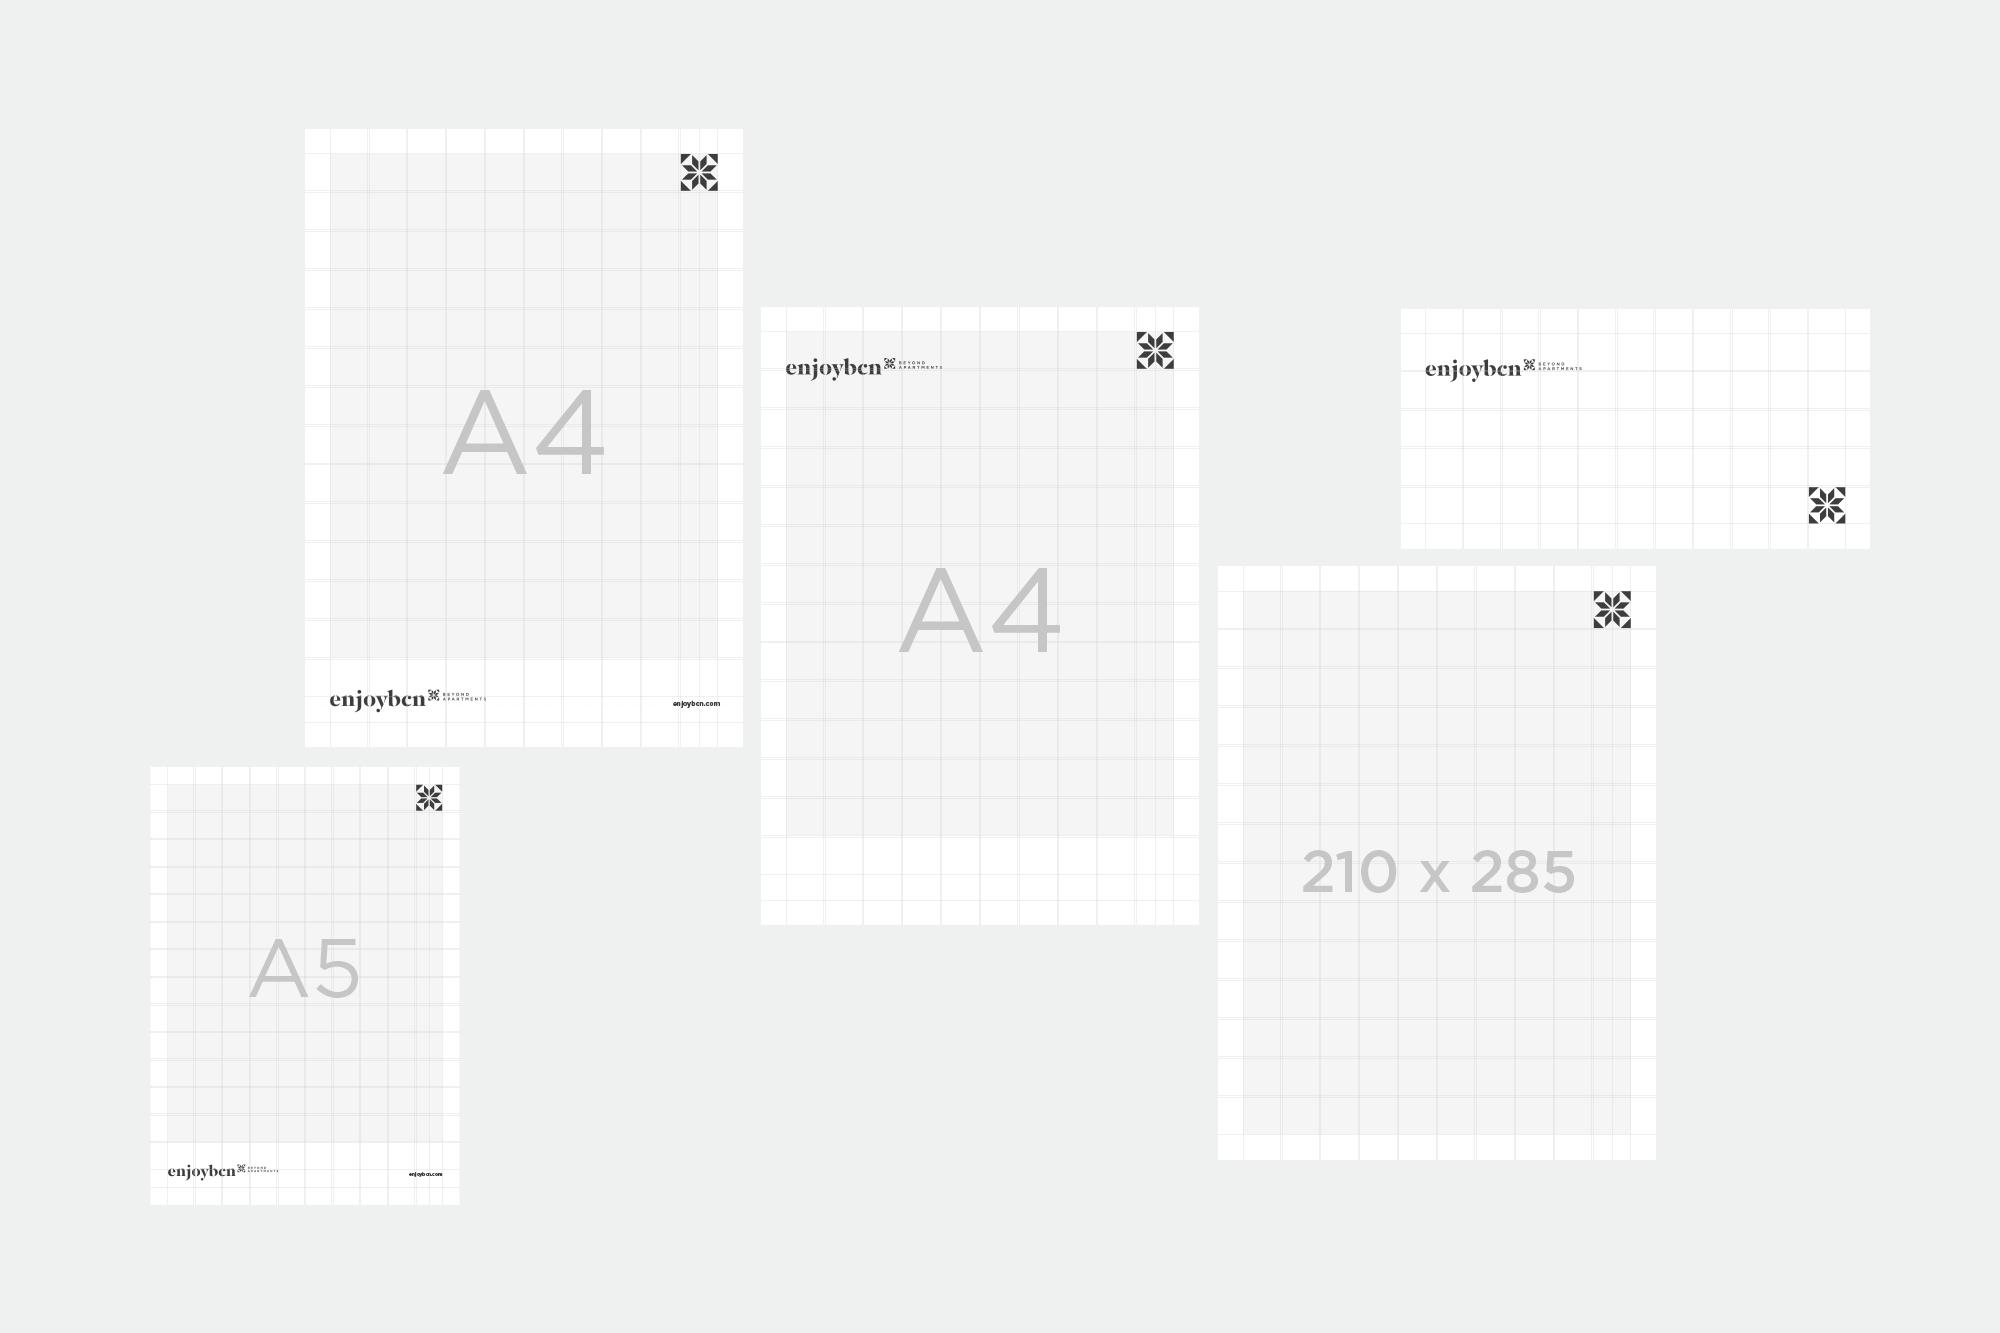 enjoybcn-layouts